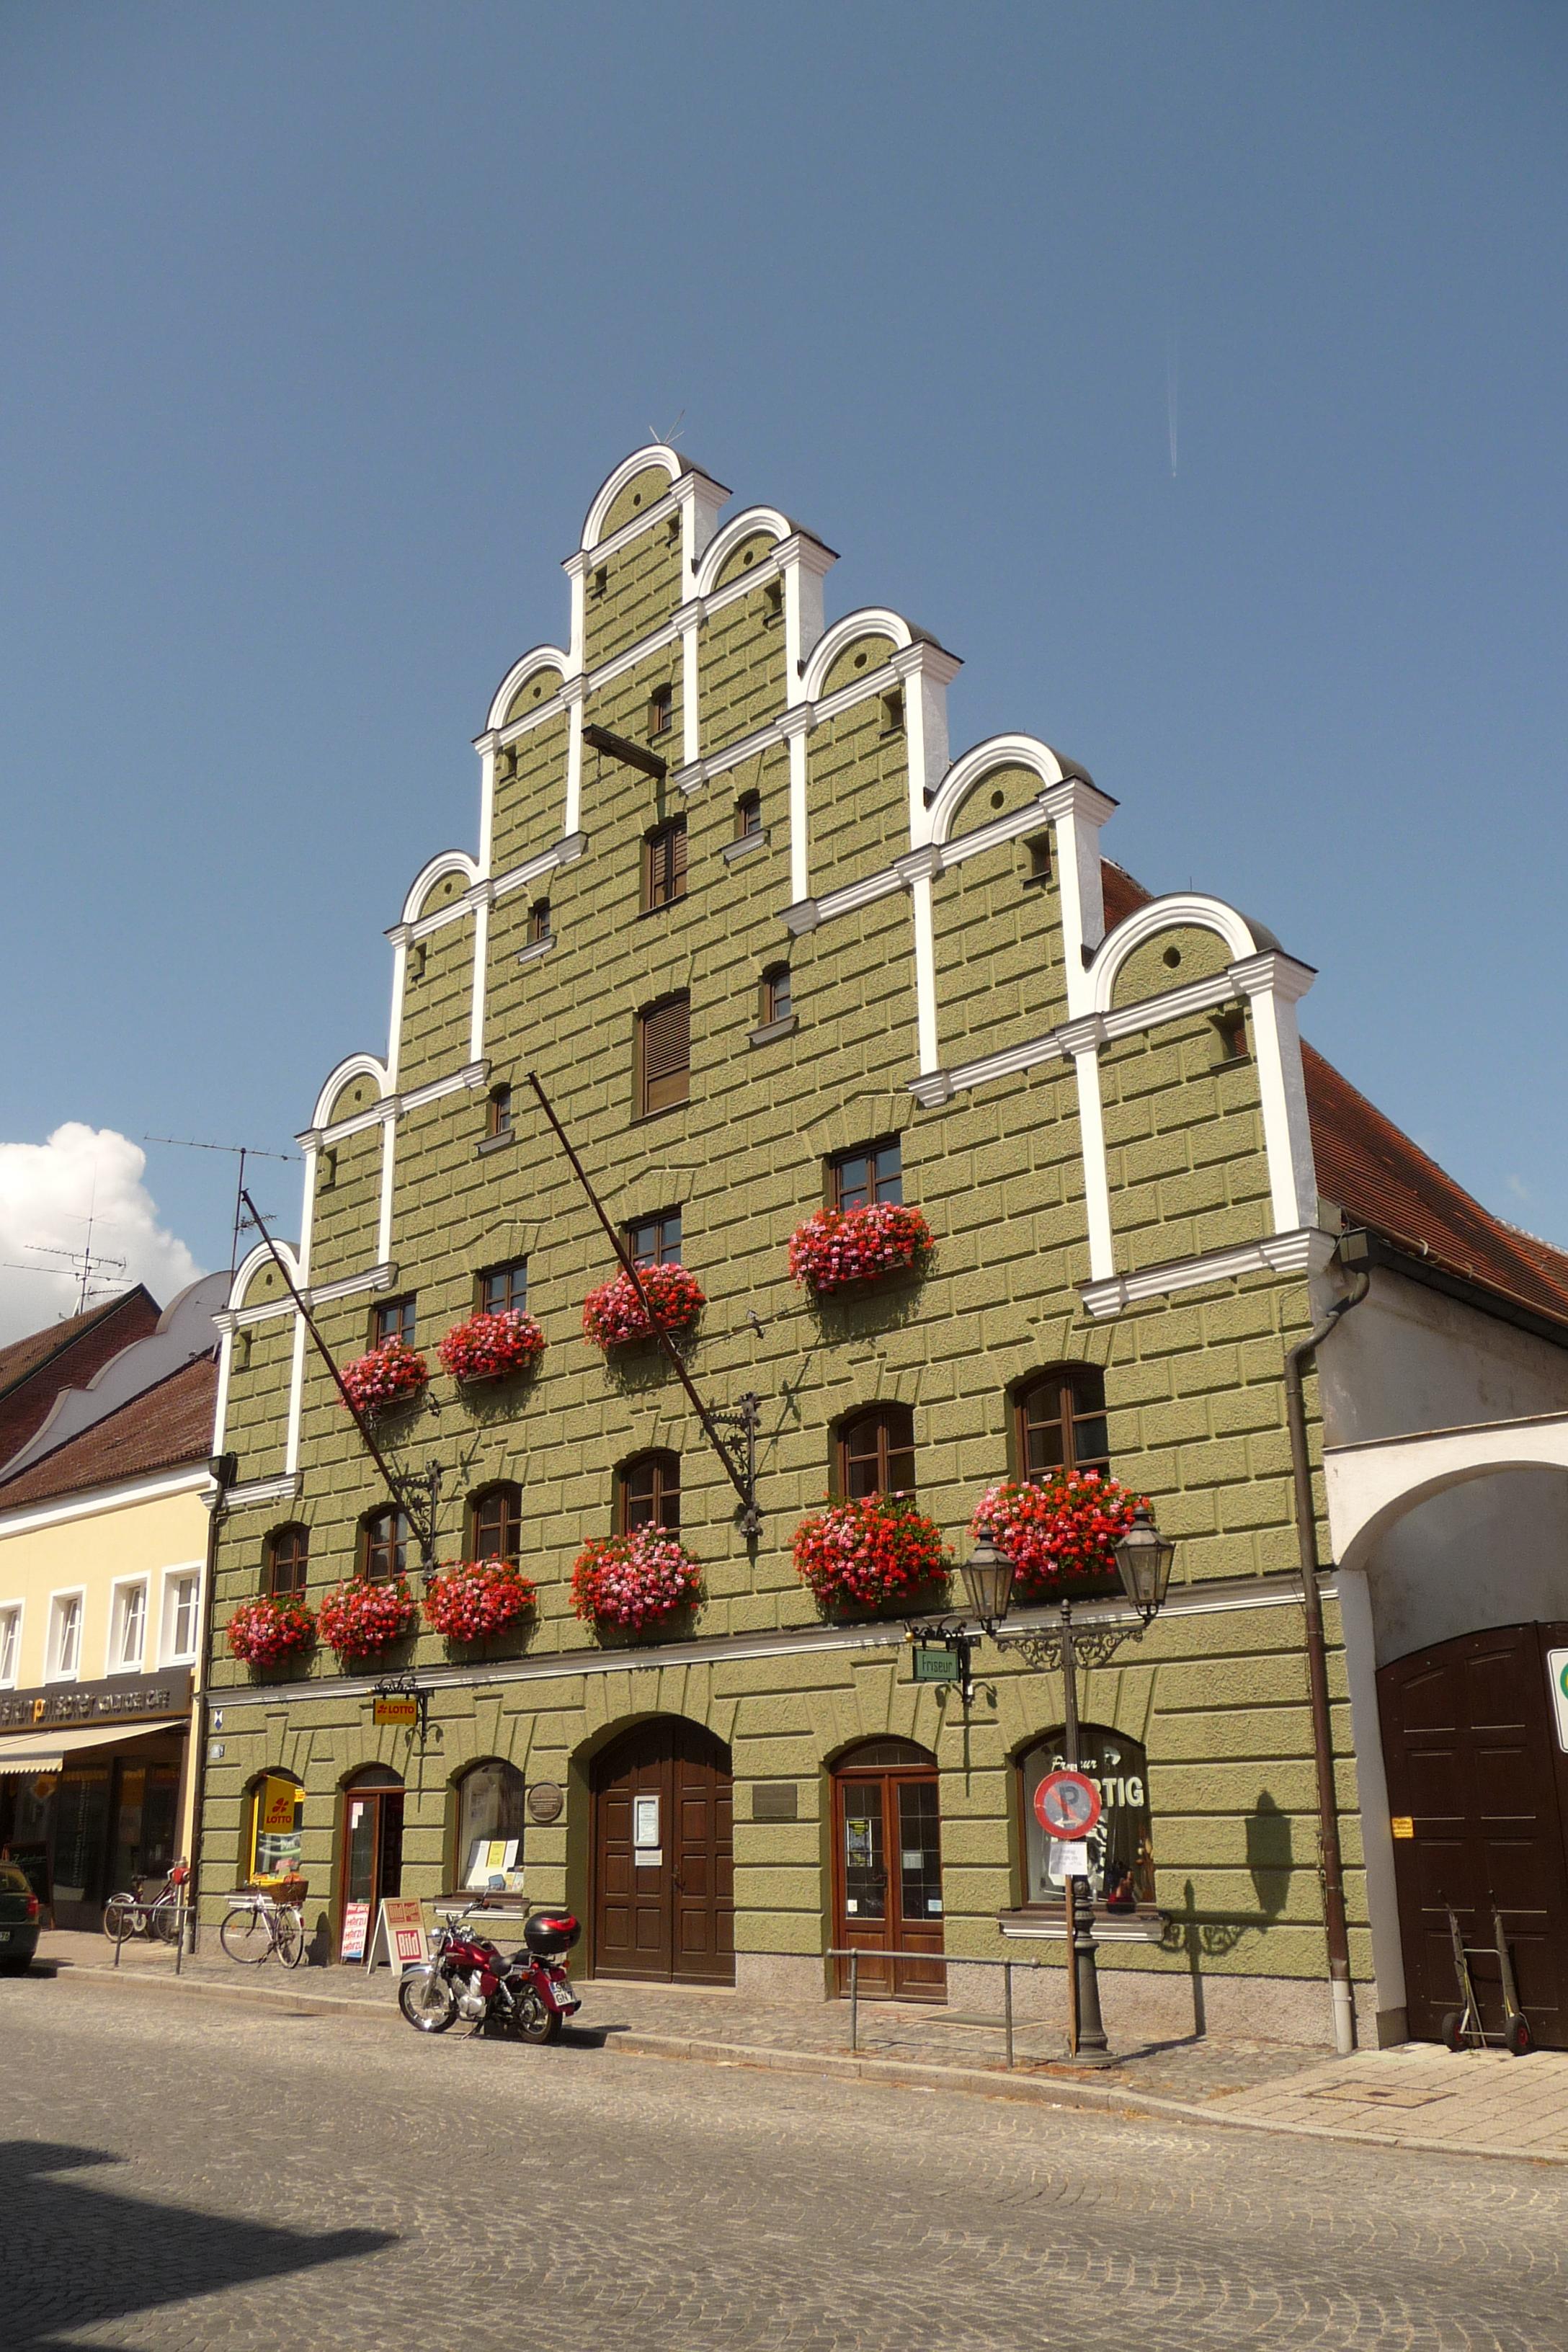 Loichingerhaus%2C_Geiselhöring.JPG